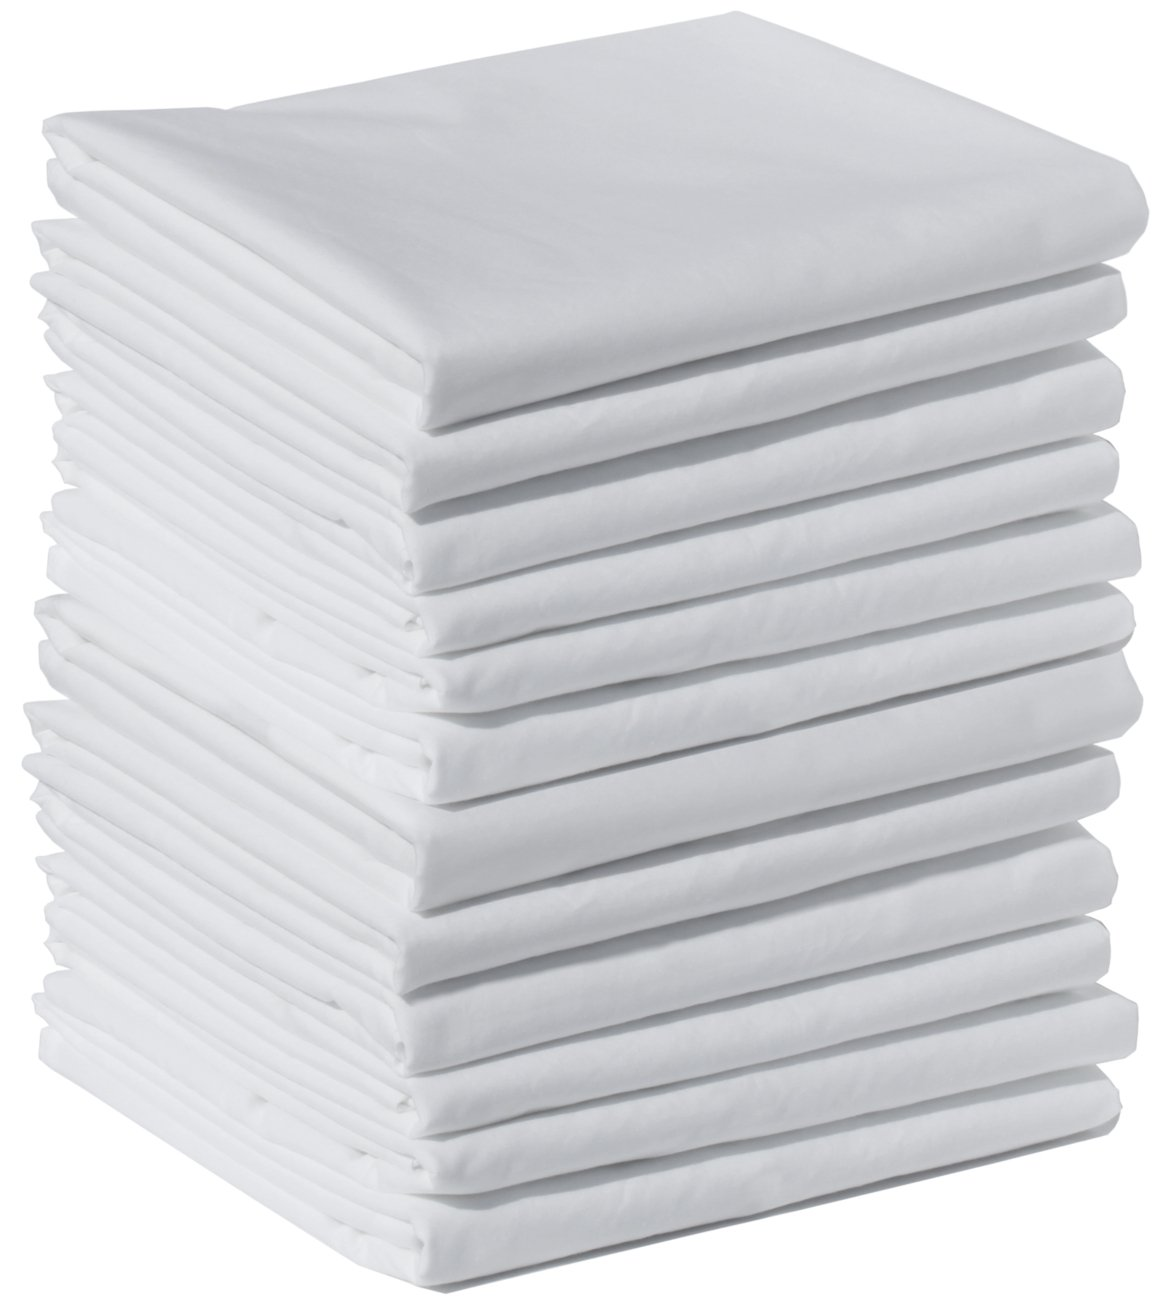 12 Queen Size 4'' Hems Bulk Lot Pack One Dozen Luxury Pillowcases 300 Thread Count 100% Long Staple Egyptian Cotton